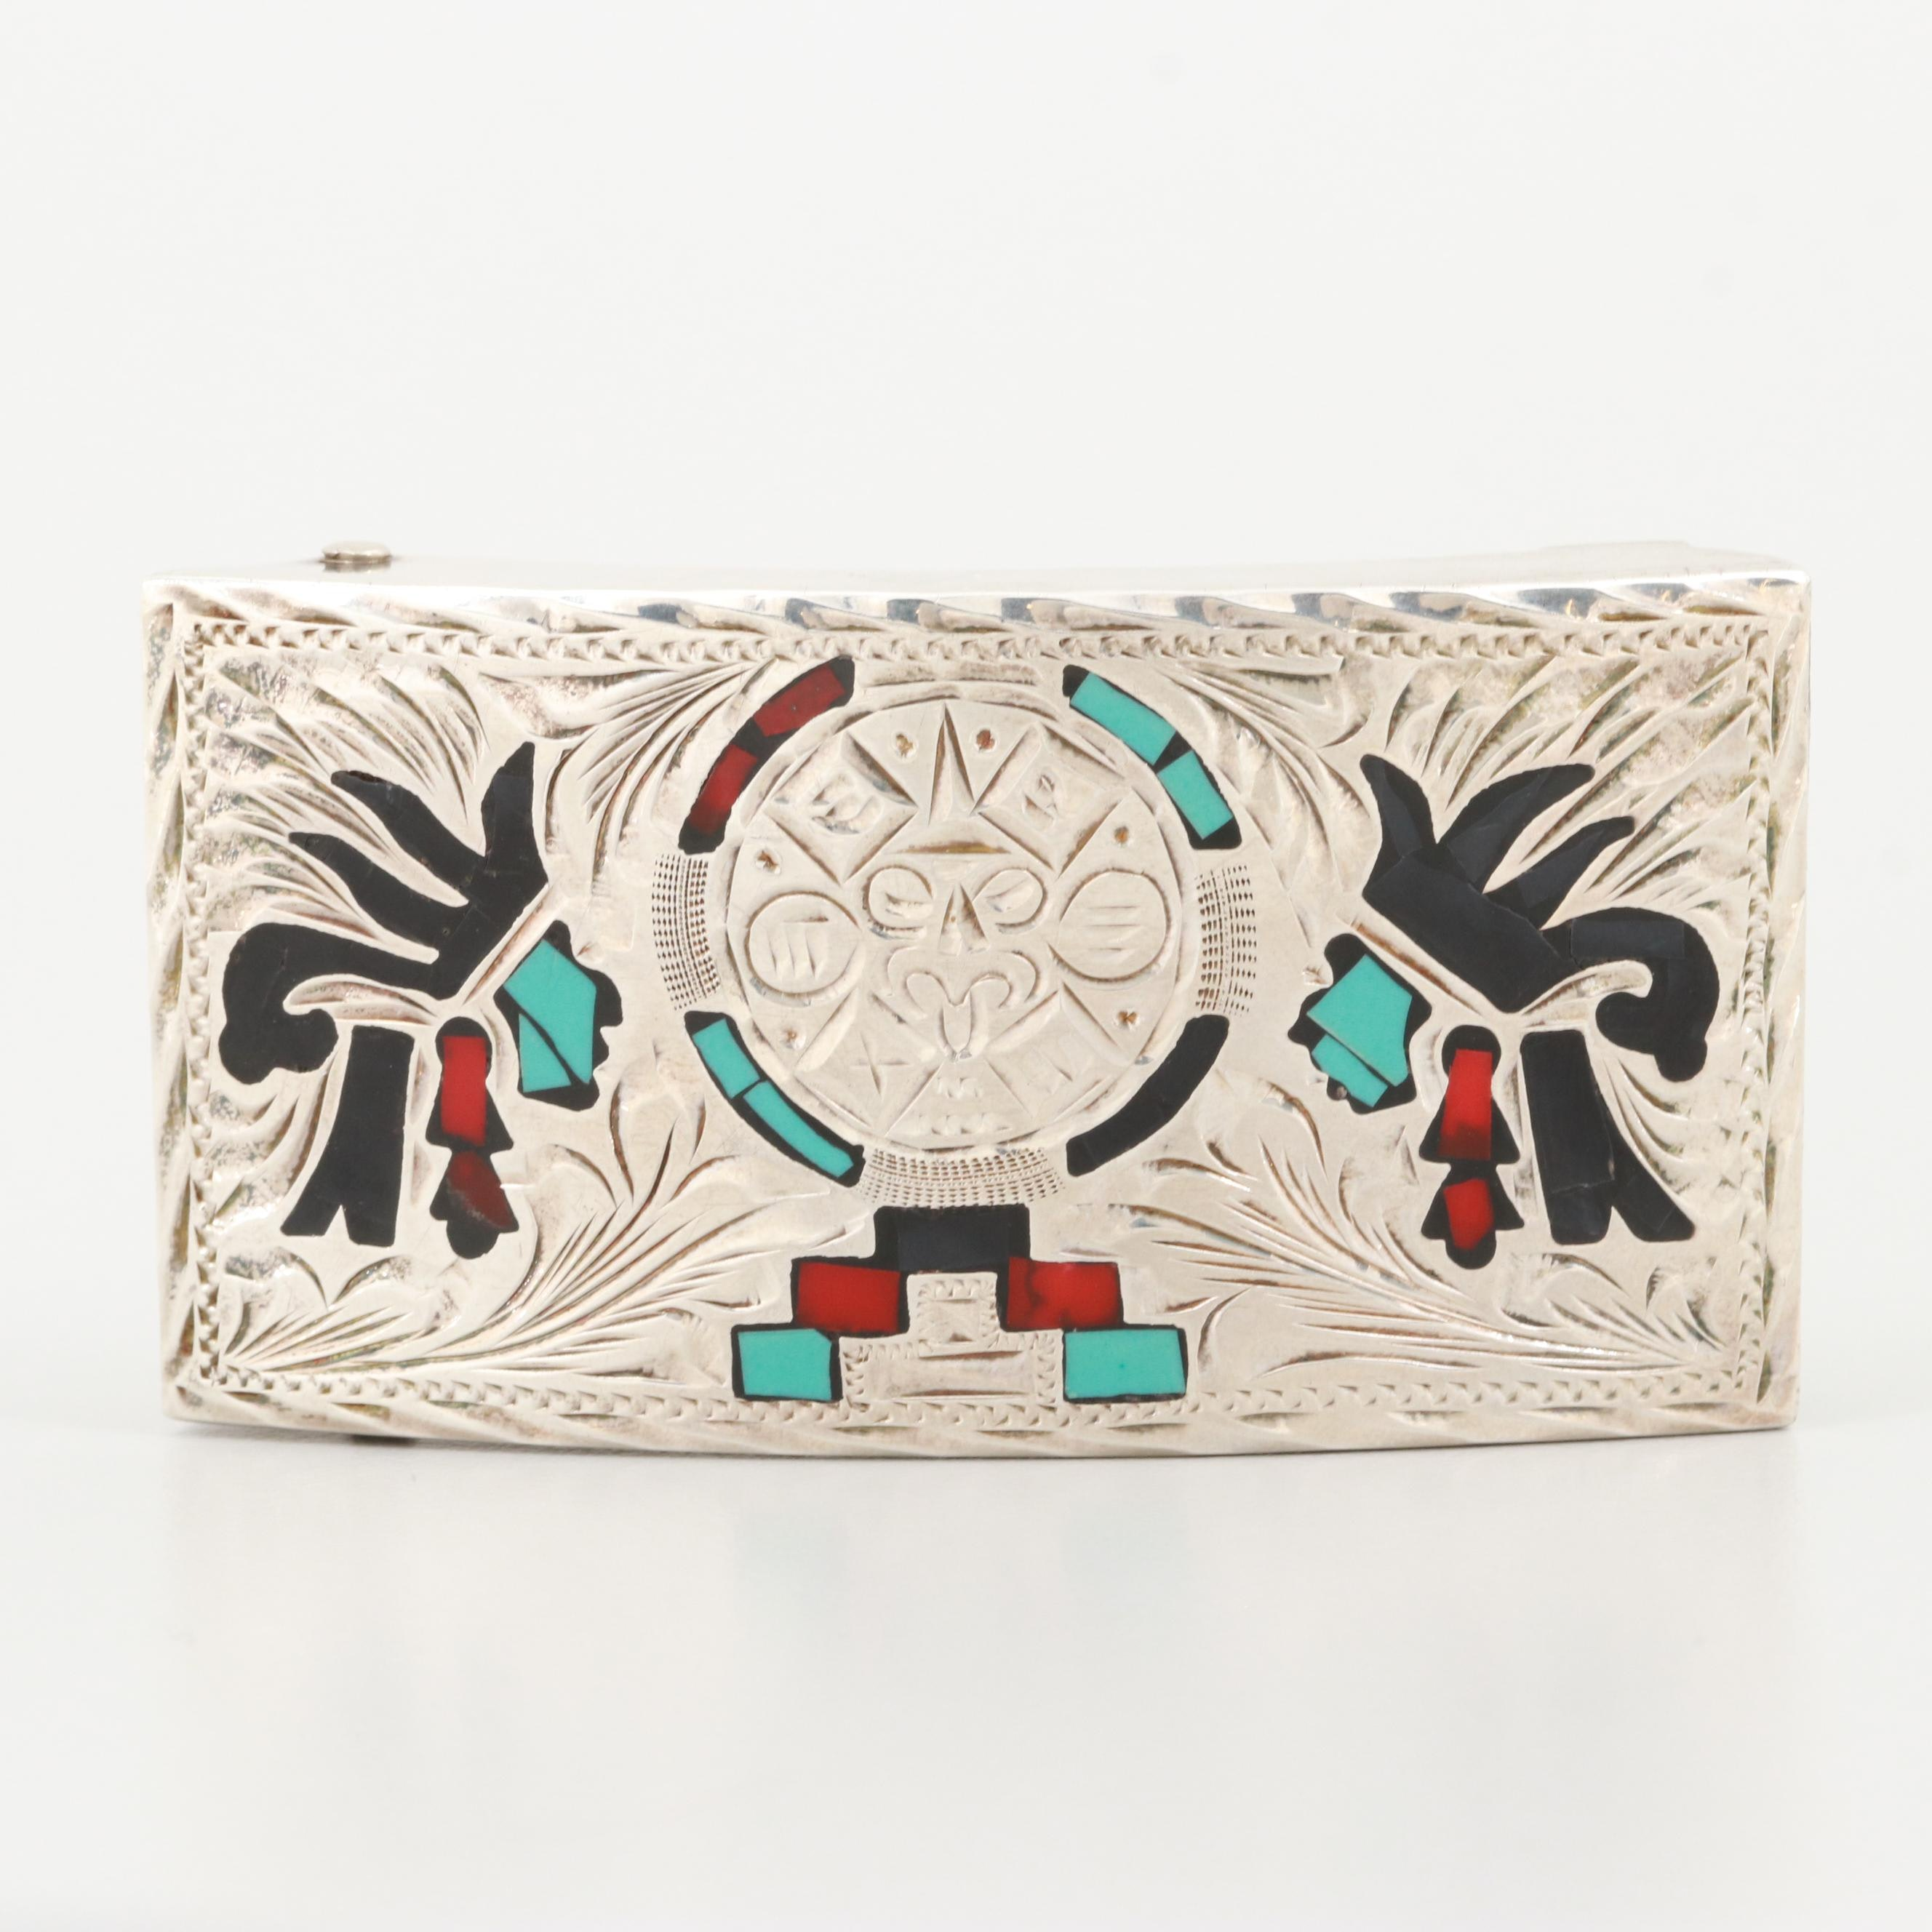 Mexican Sterling Silver Imitation Gemstone Inlaid Belt Buckle, Vintage